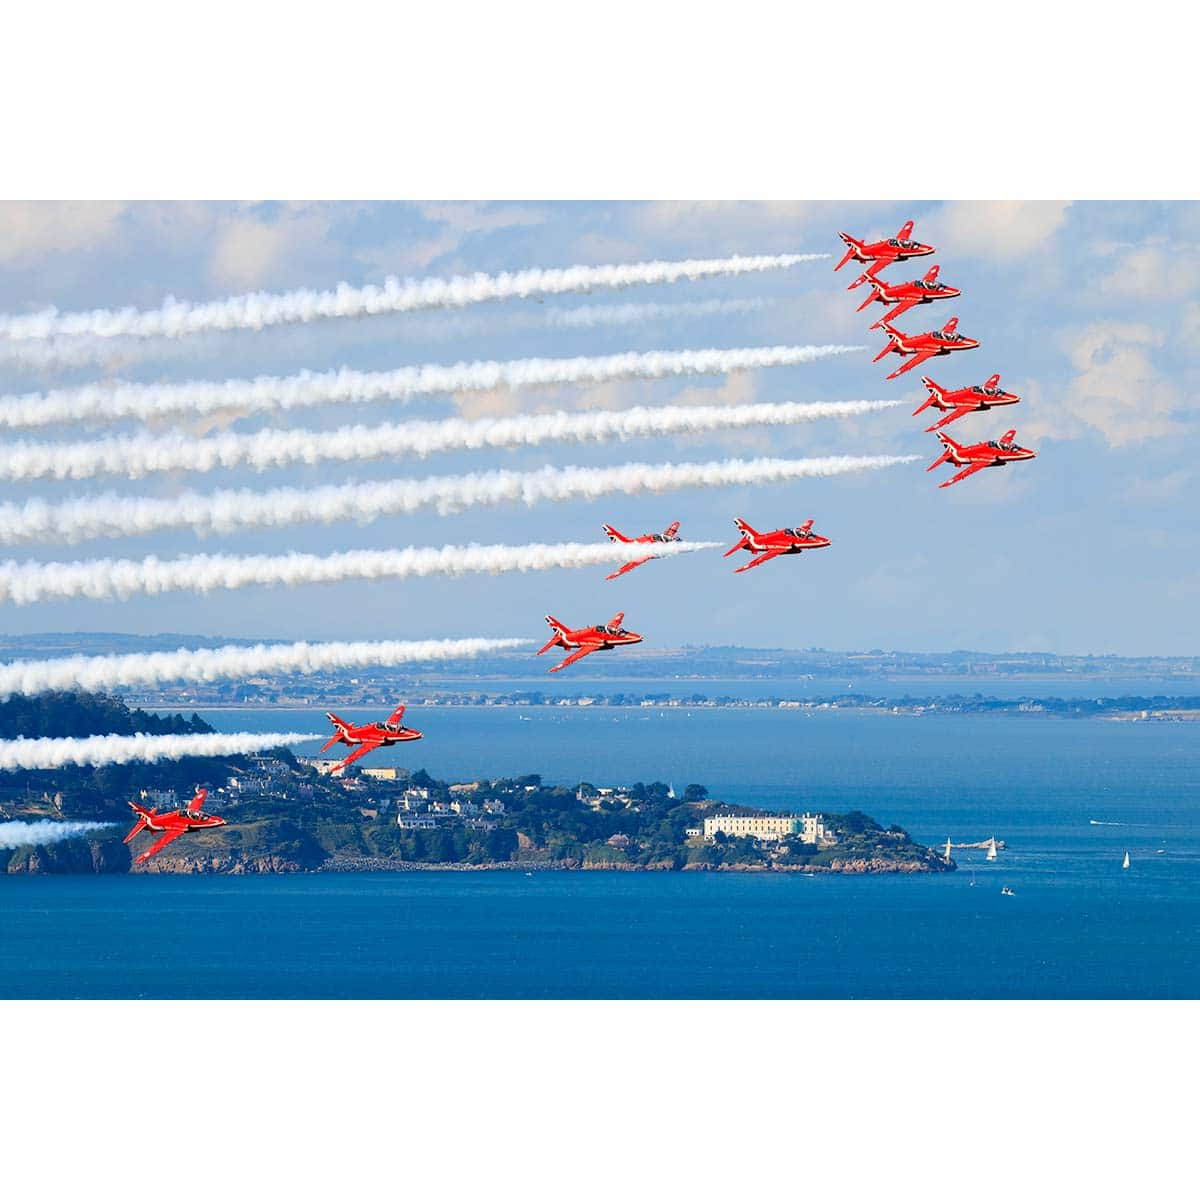 RAF Red Arrows over Killiney Bay